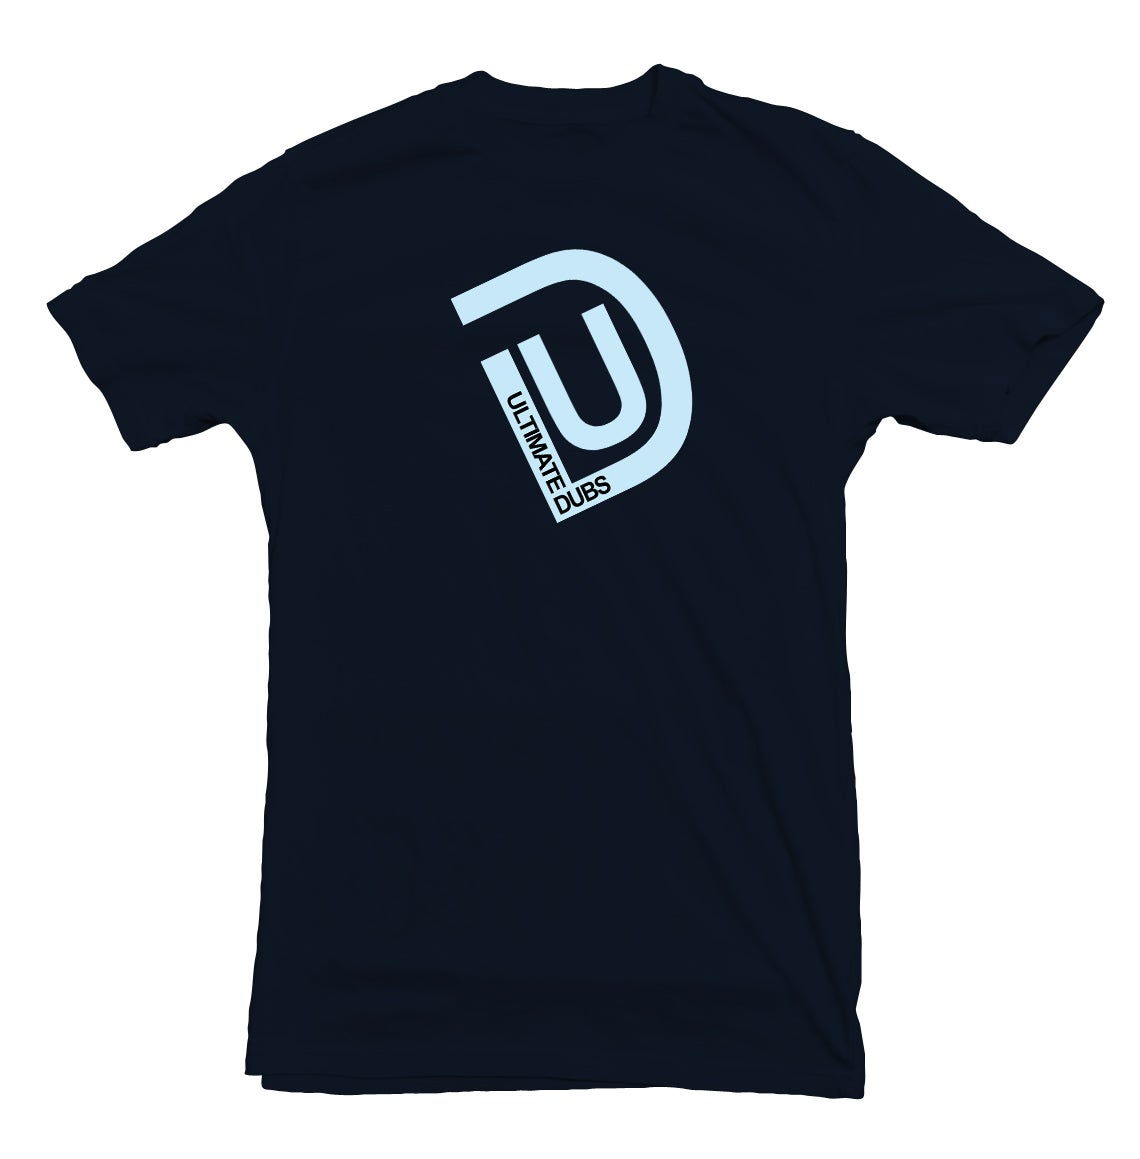 Image of Men's Ultimate Dubs - UD Logo T-Shirt - Navy Blue with Pale Blue Logo